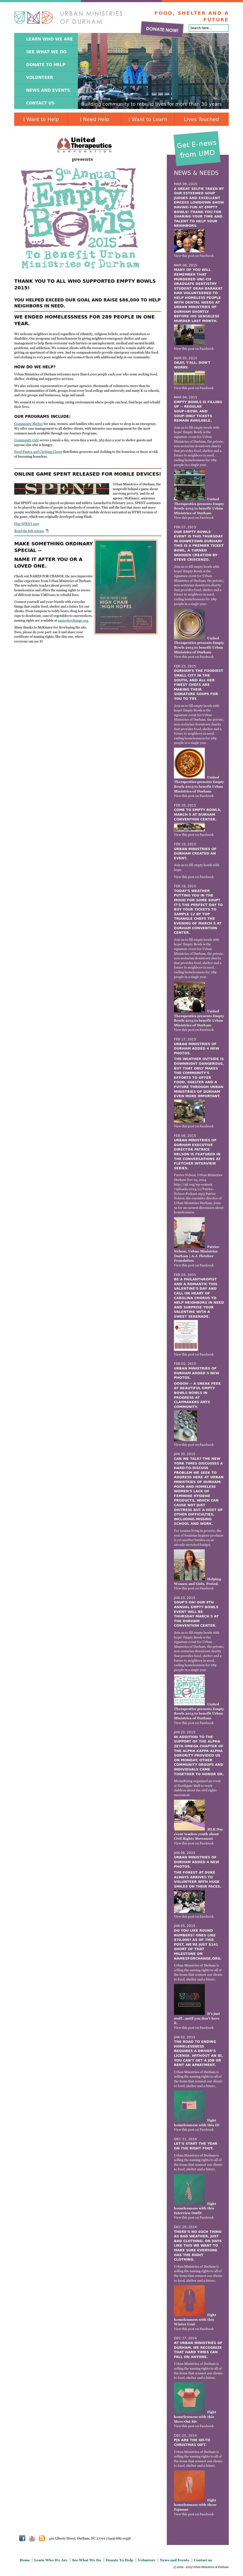 Umdurham Competitors, Revenue and Employees - Owler Company